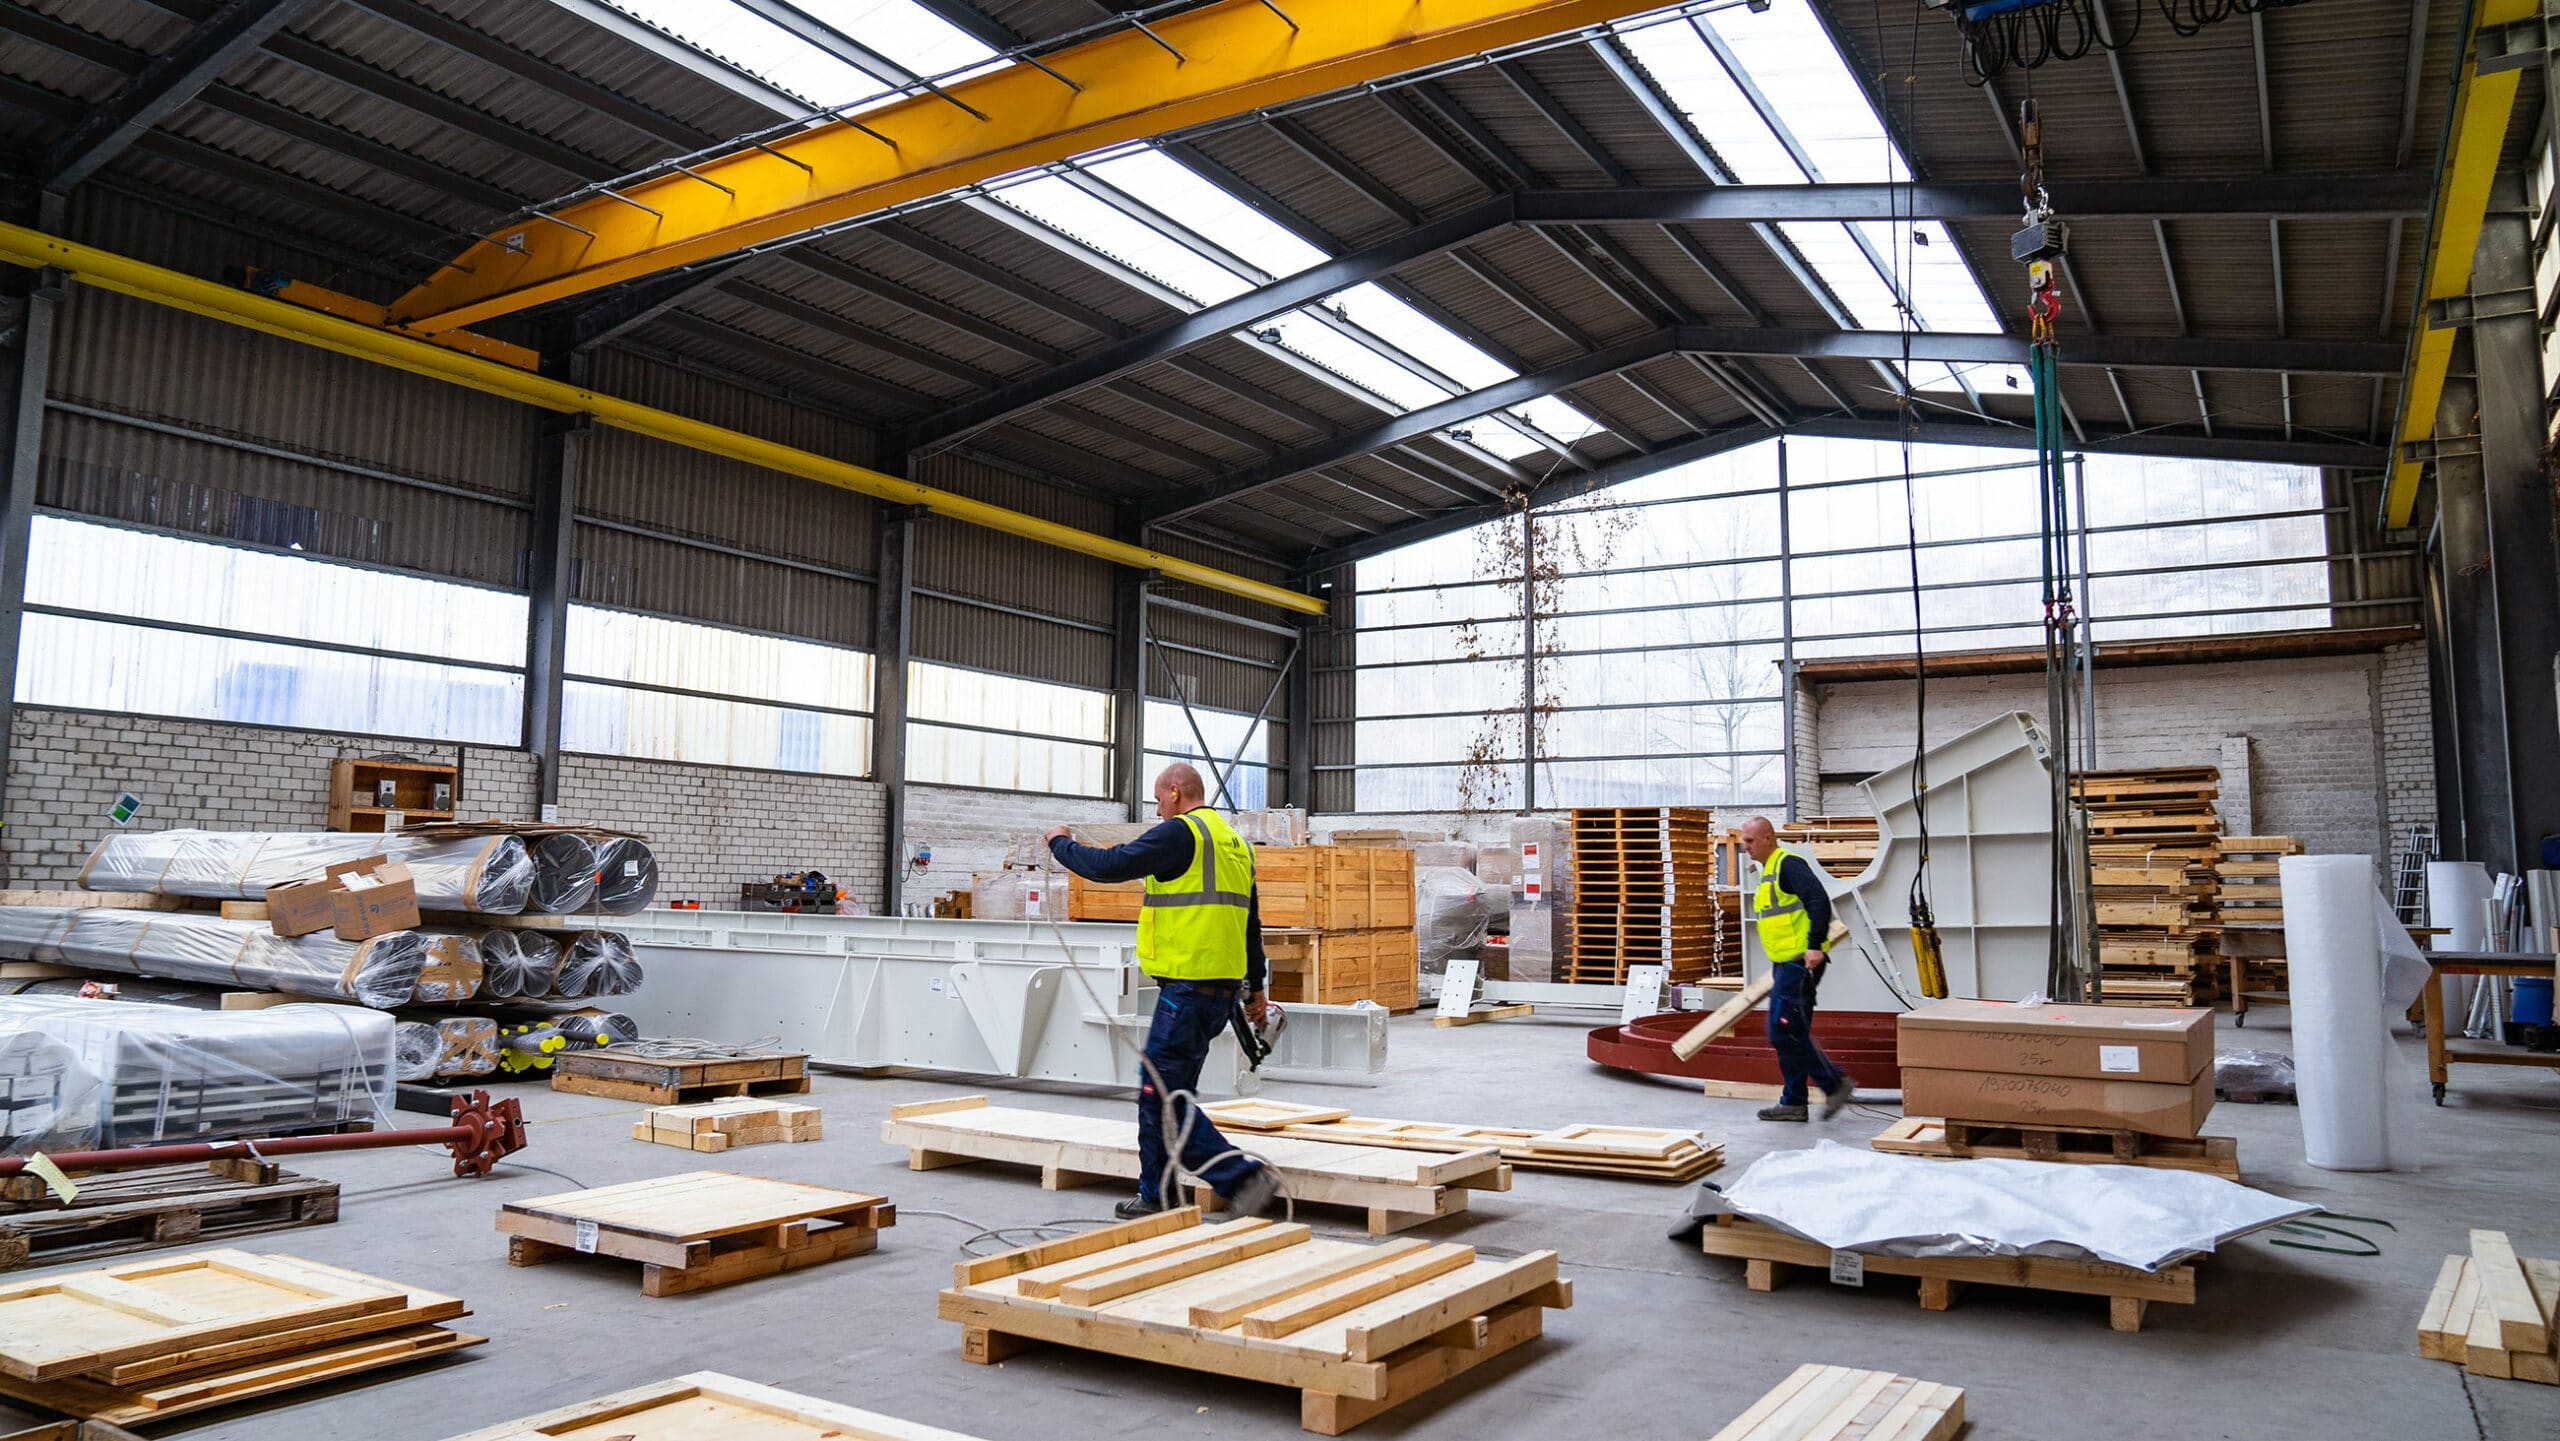 Sendenhorst: duisport packing logistics GmbH